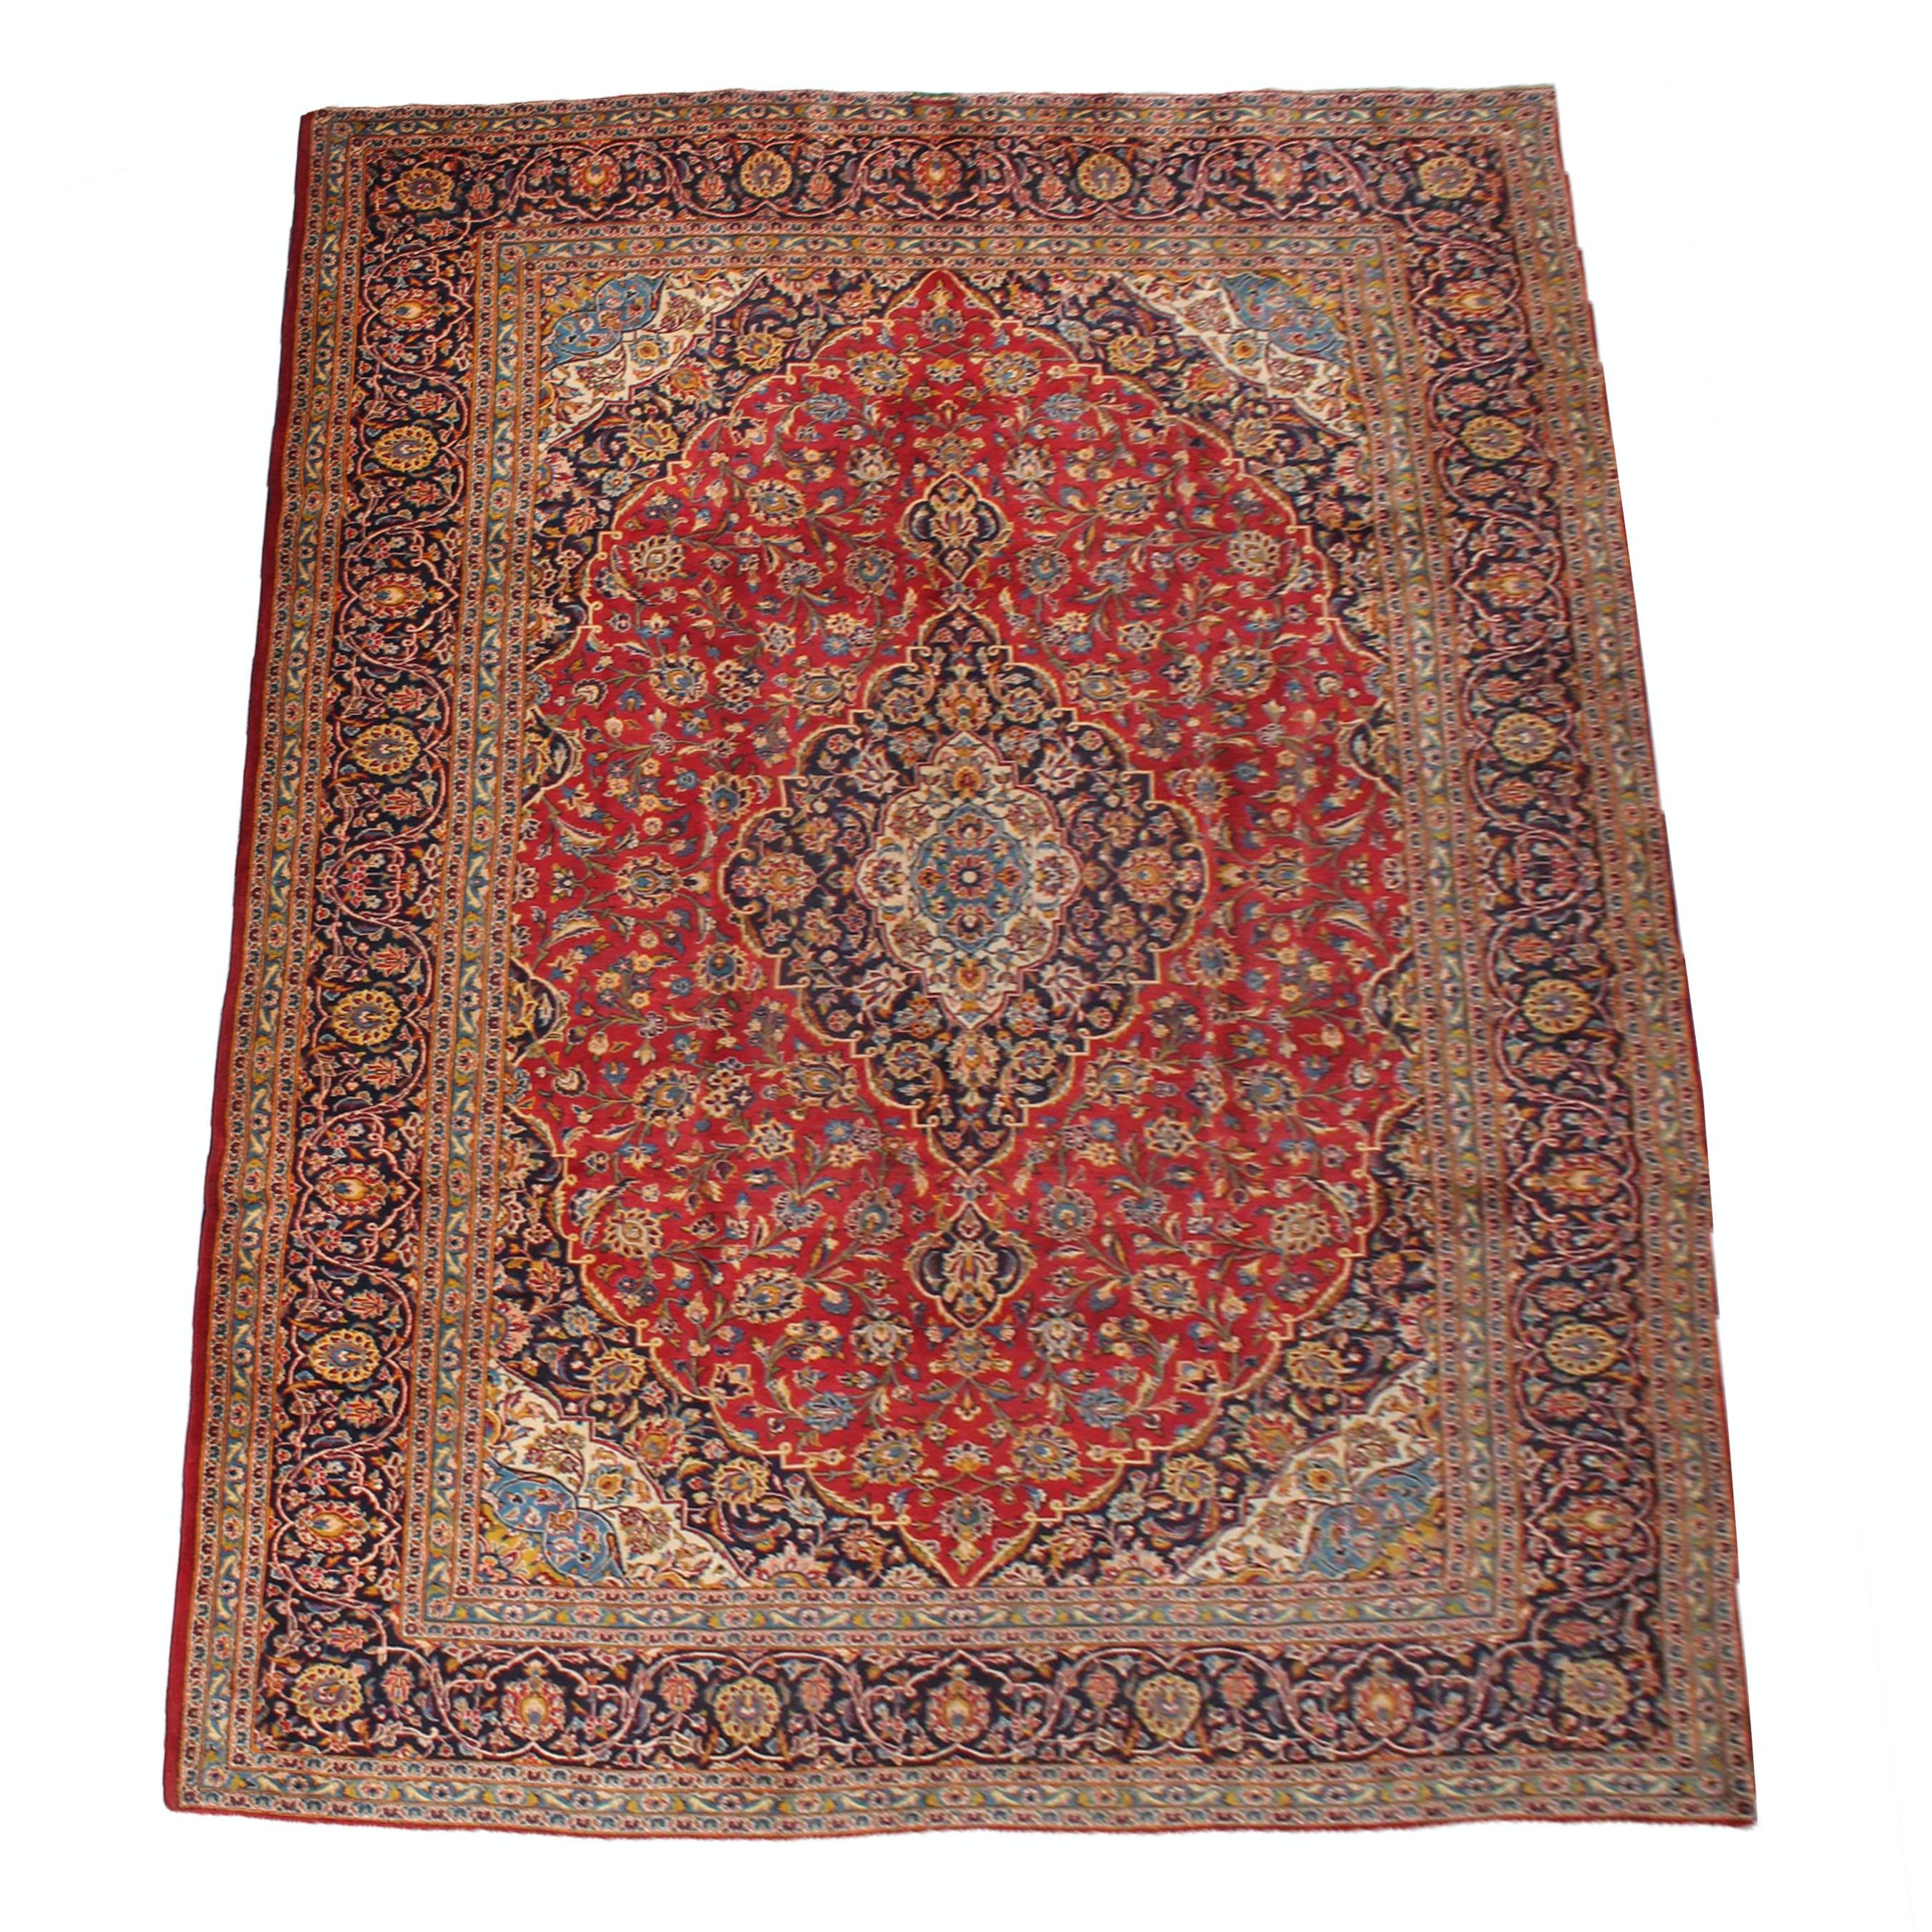 "10' x 13' Vintage Hand-Knotted Persian Kashan Room Size Rug Signed ""Ghottbi"""